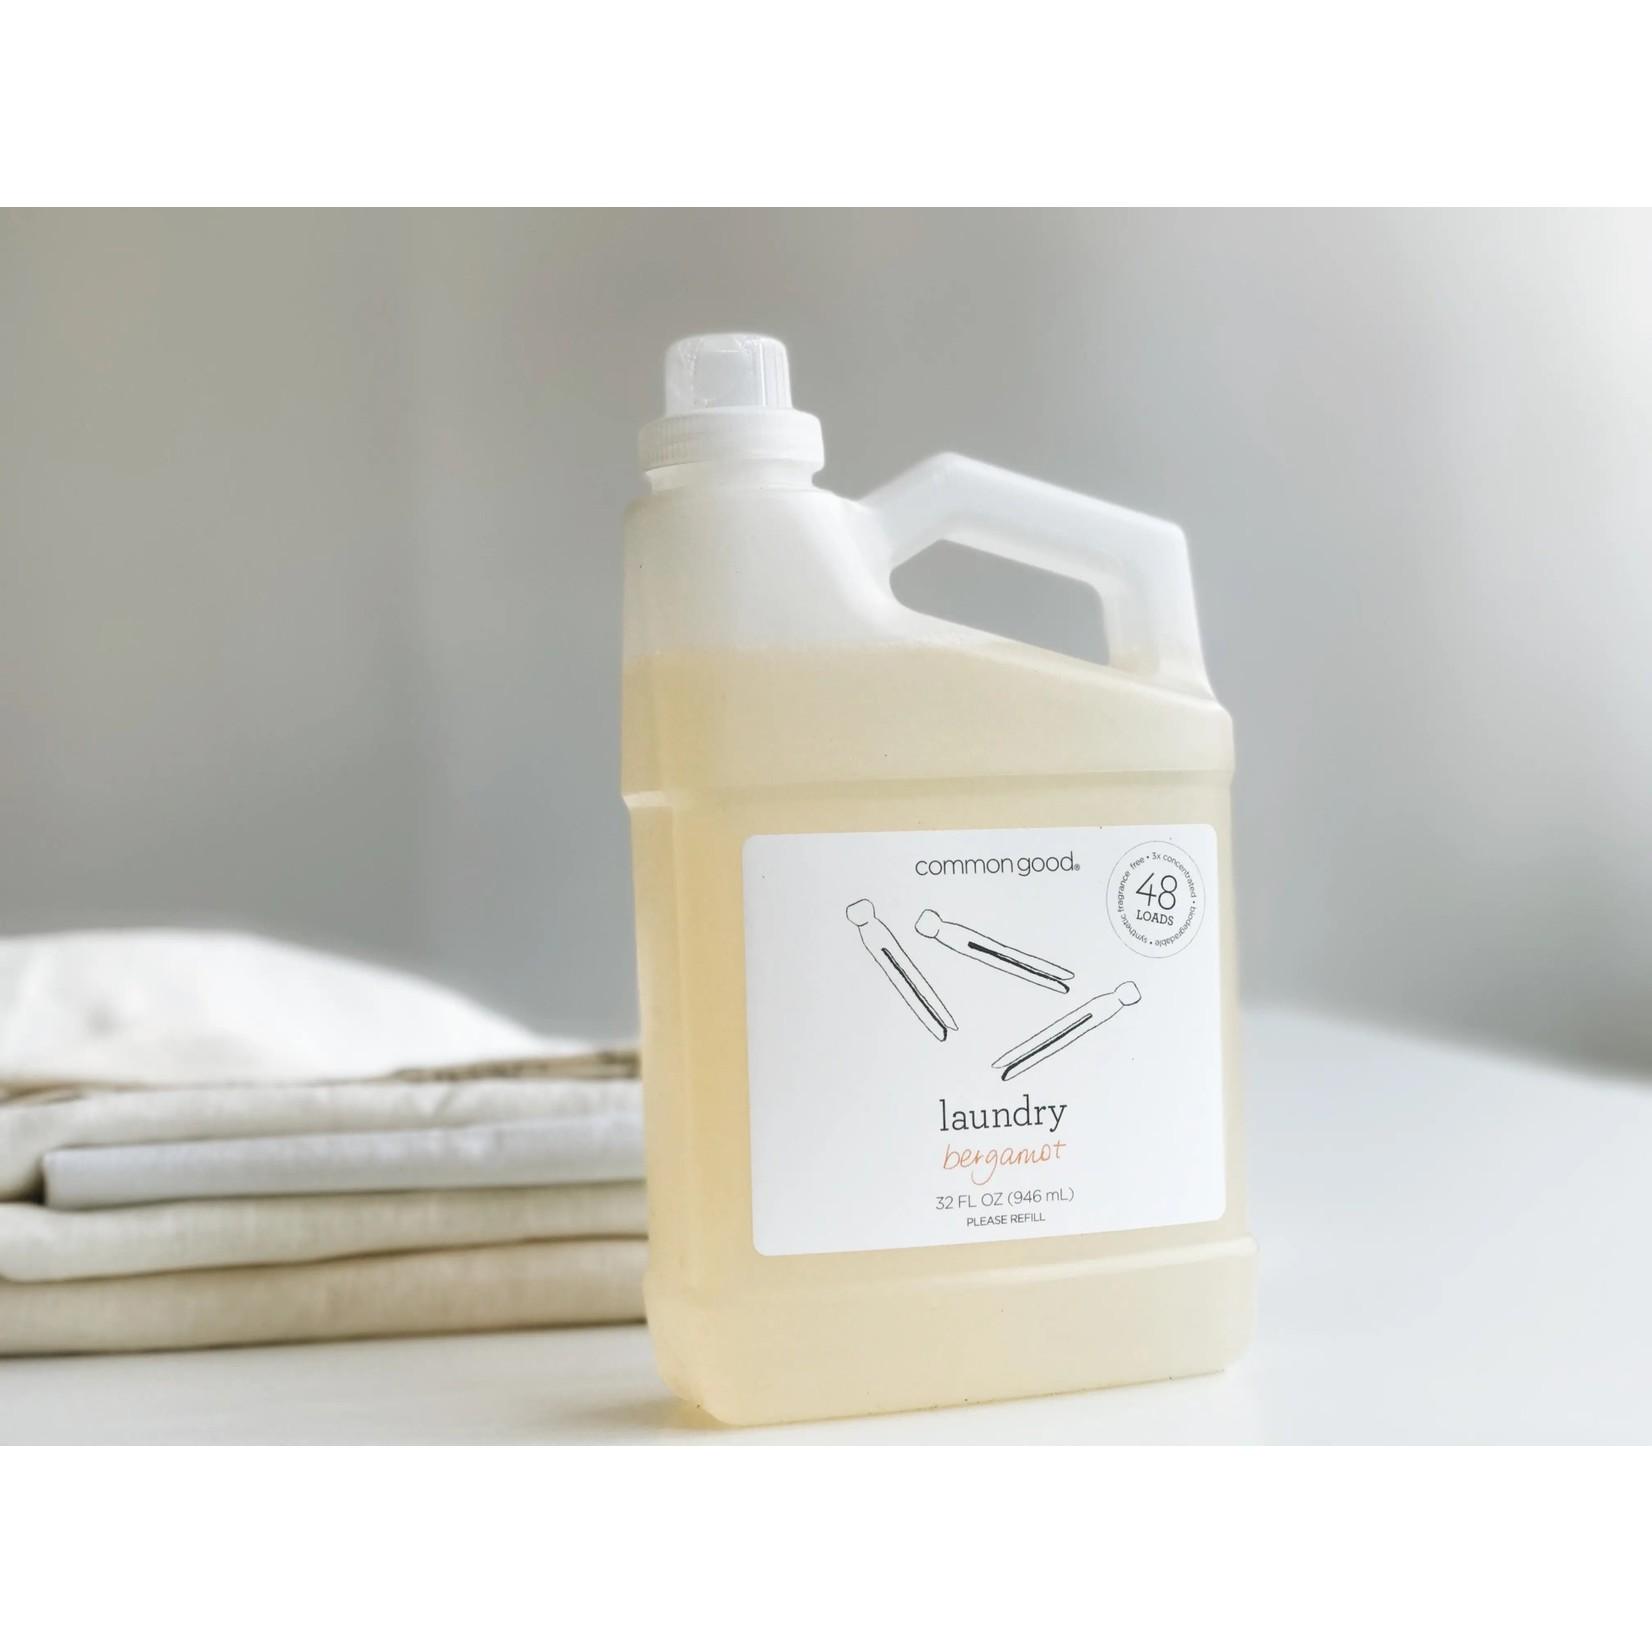 Bergamot Laundry Detergent 32 oz